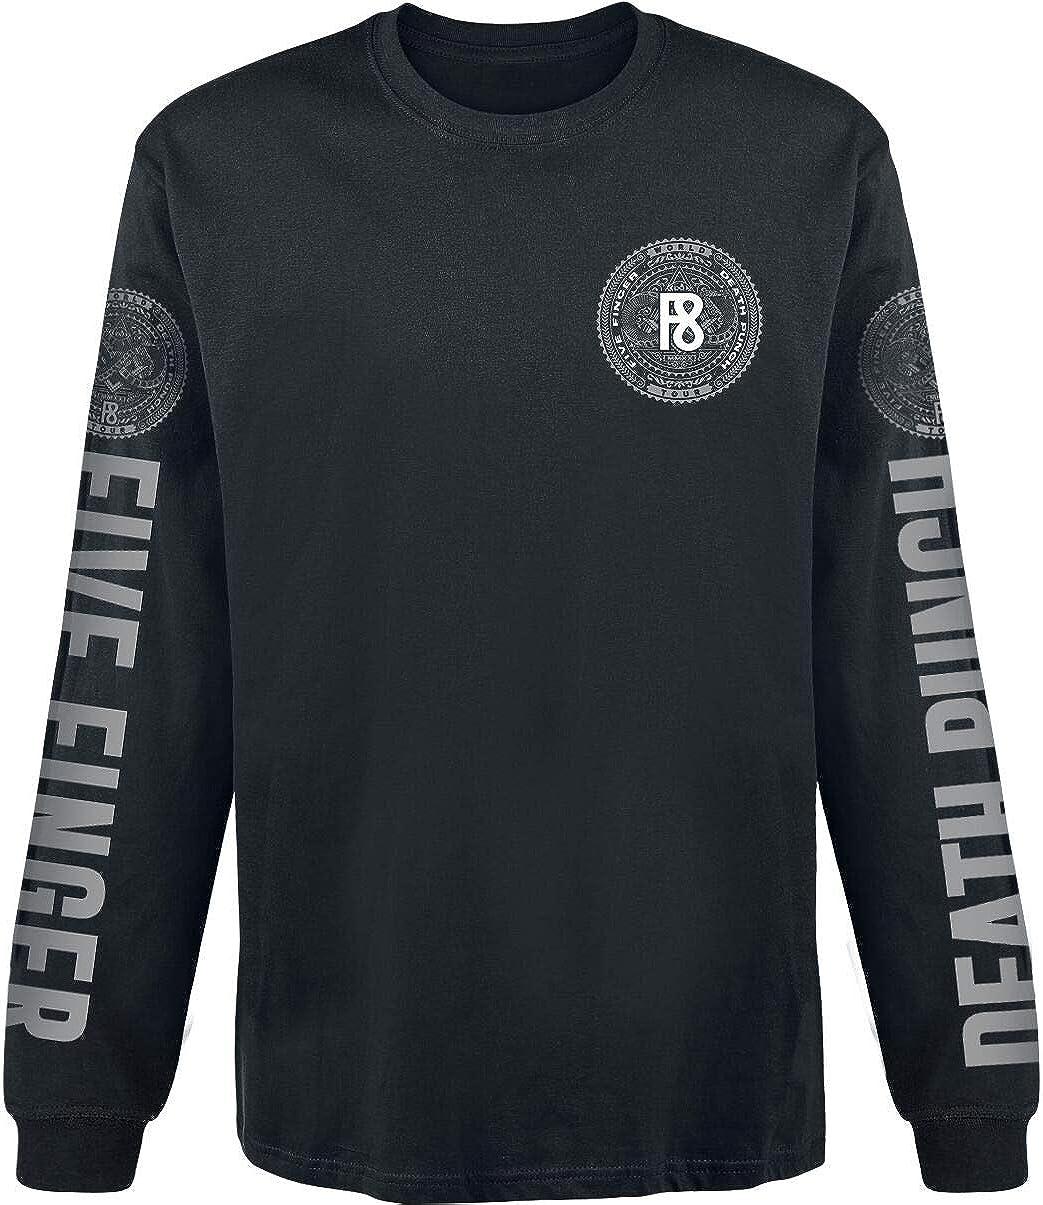 Regular Five Finger Death Punch F8 Men Long-Sleeve Shirt Black